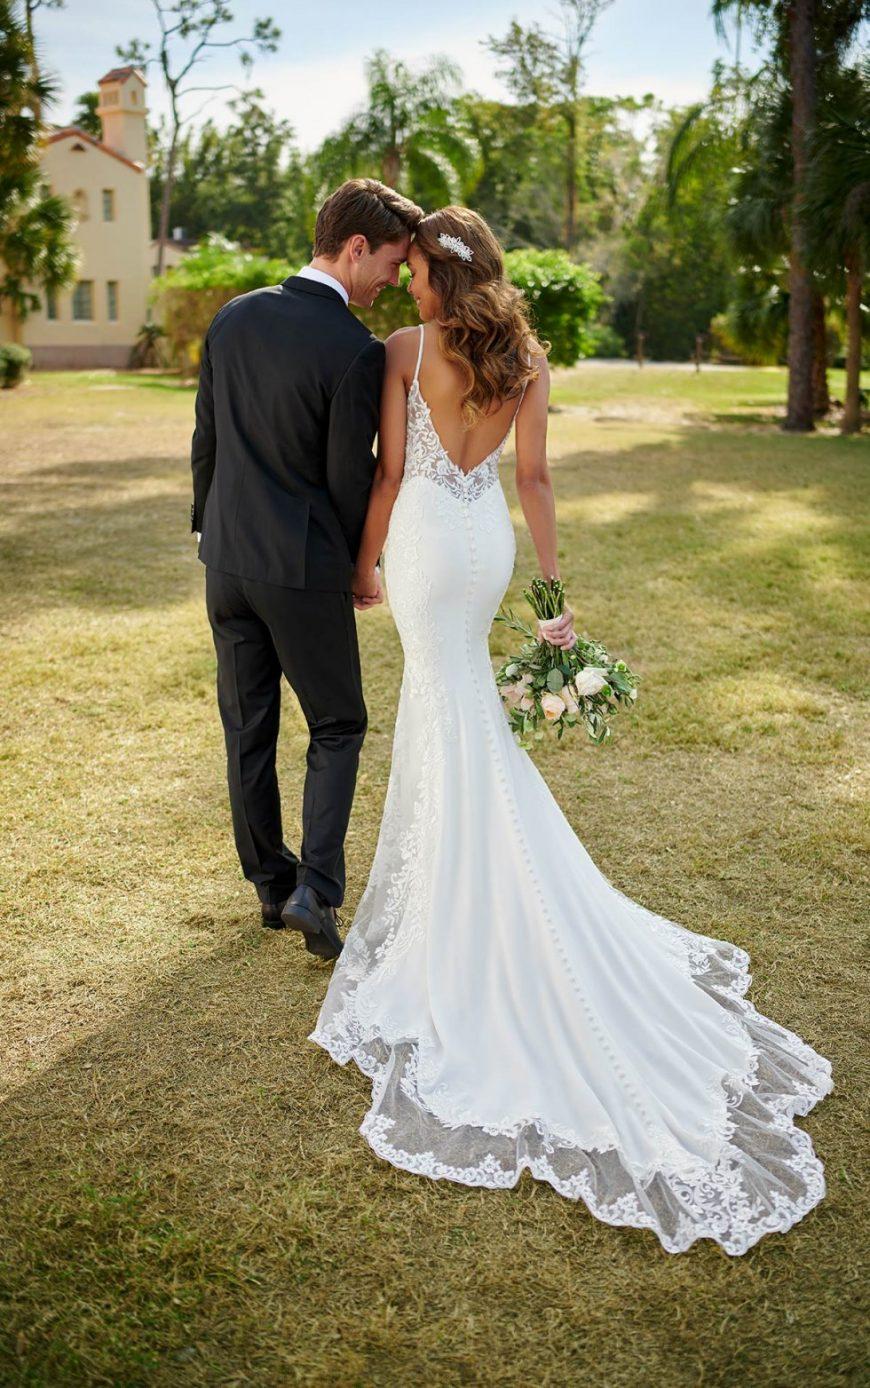 Fit-and-Flare Wedding Dress Sexy V-Neckline Open V-back Thin straps Lace Stella York 7118 Tuscany Bridal